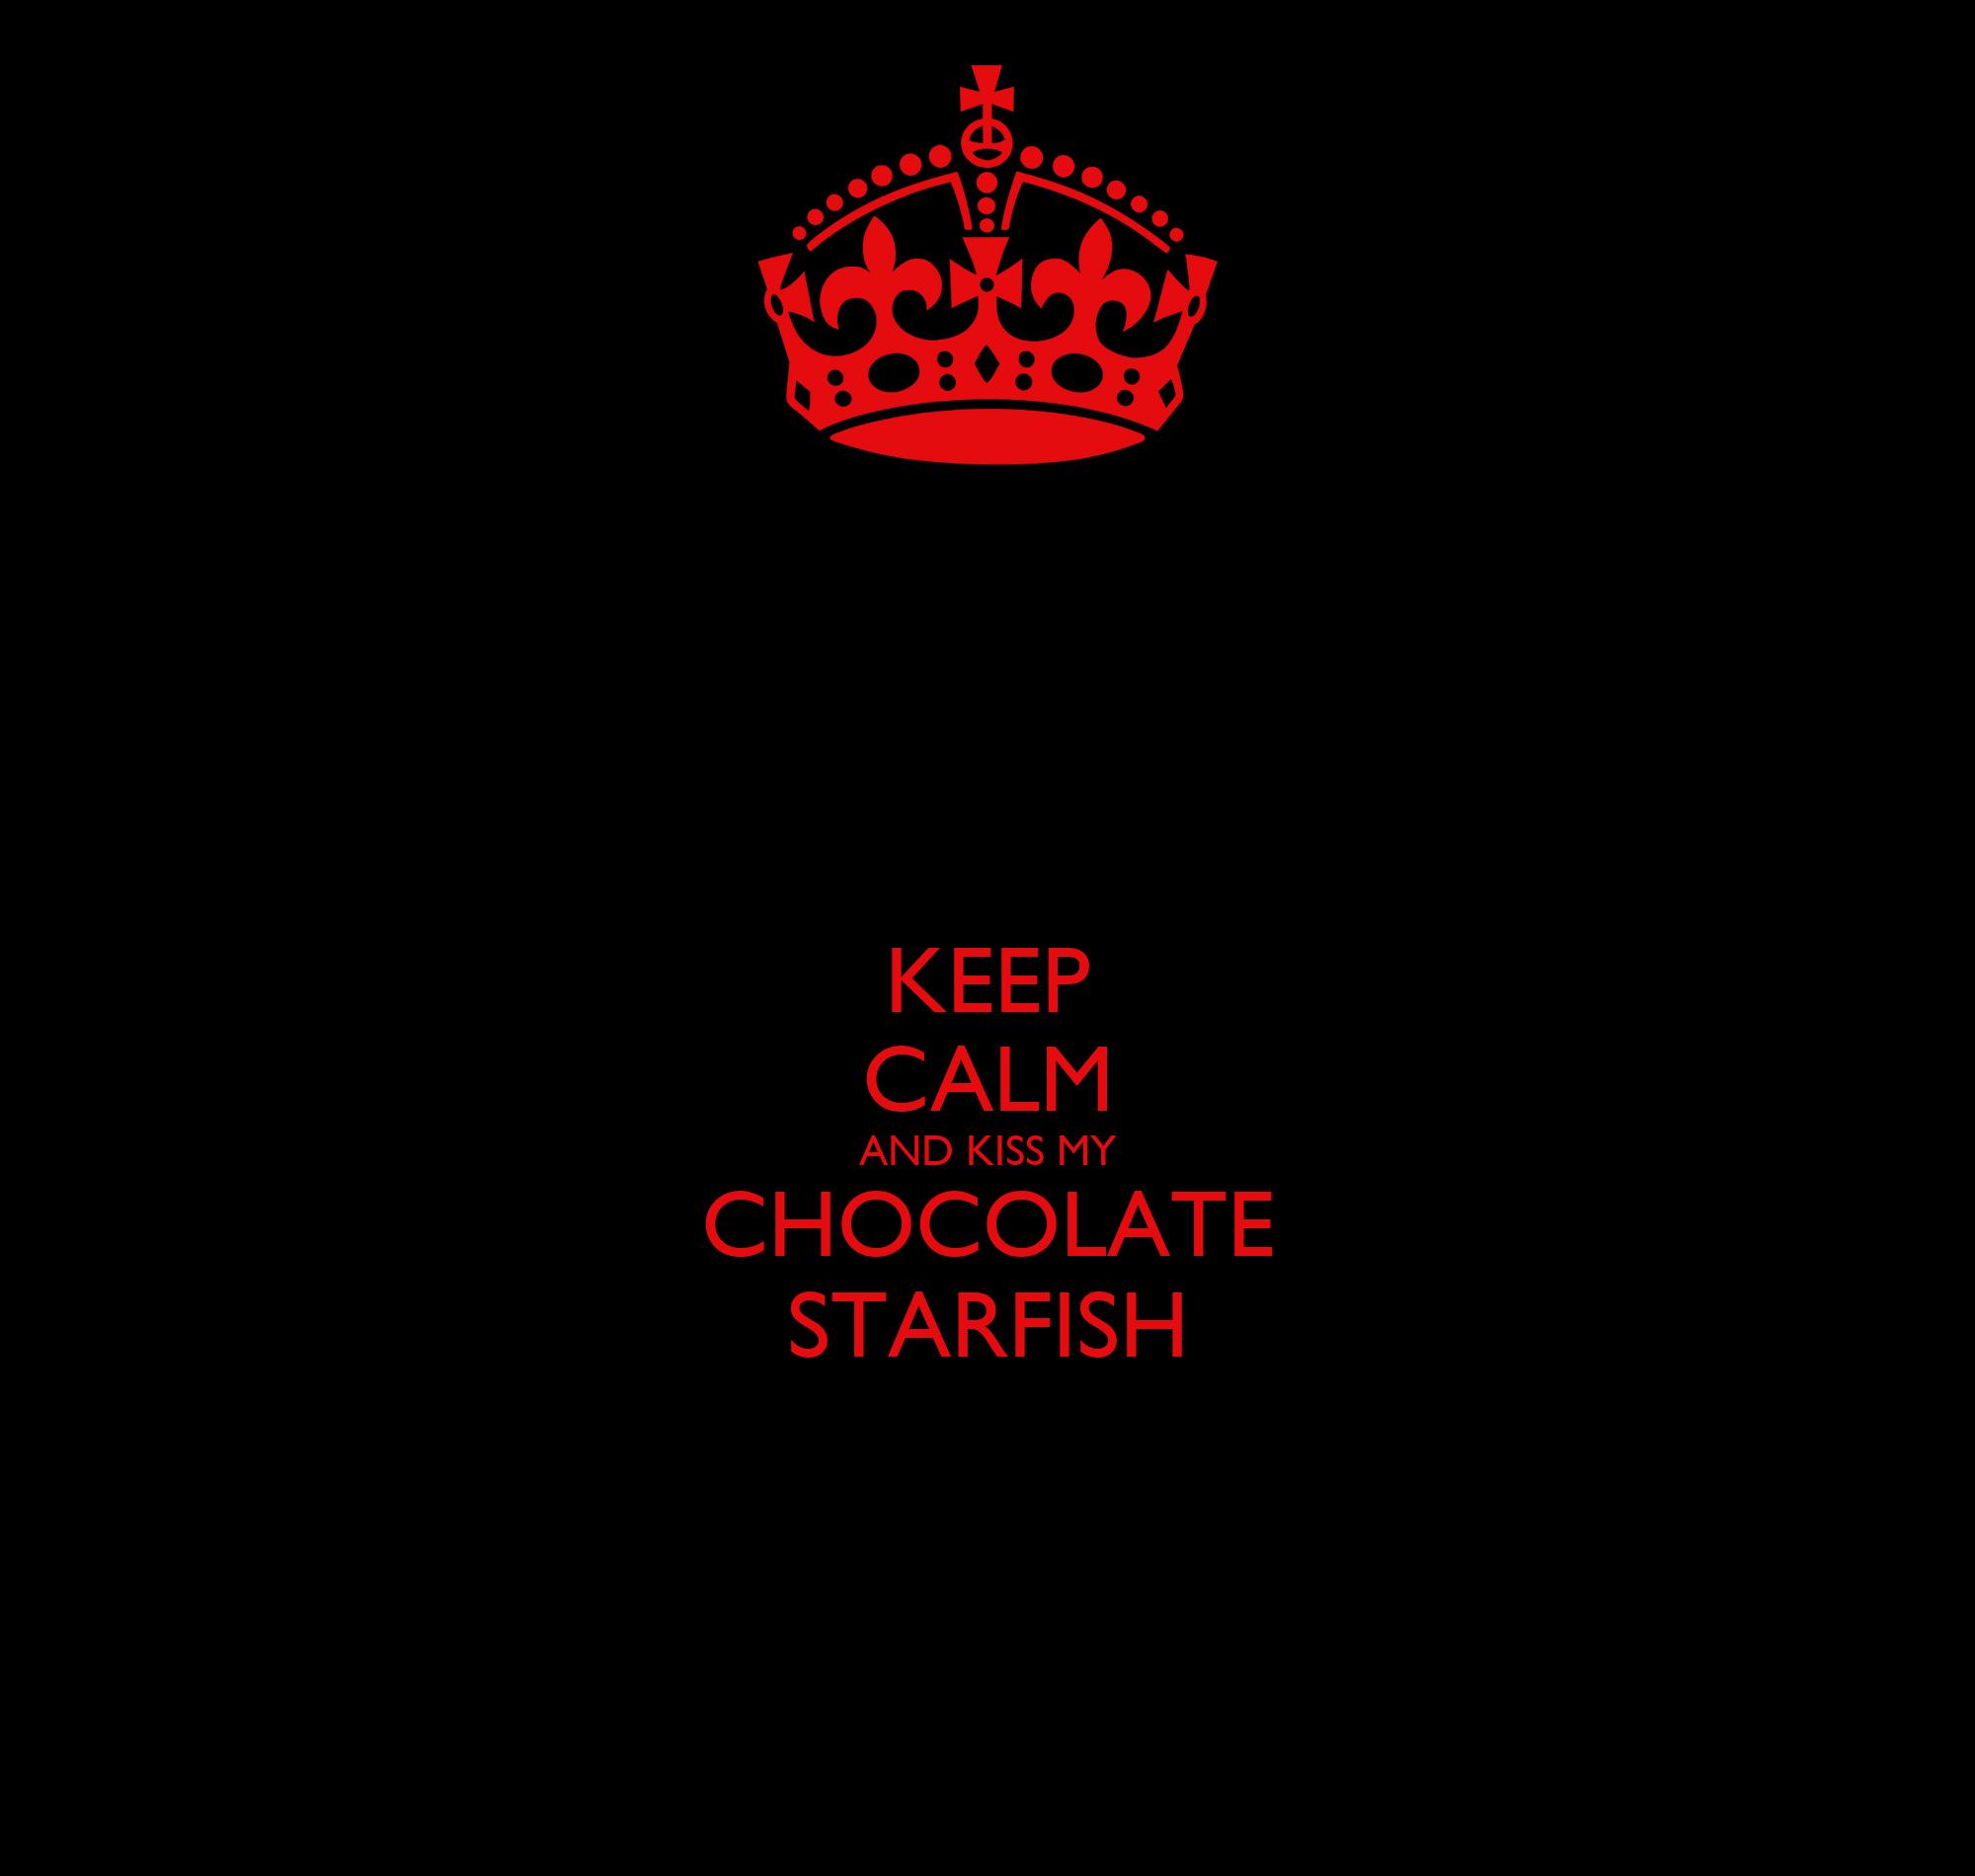 KEEP CALM AND KISS MY CHOCOLATE STARFISH Poster | MERI | Keep Calm ...